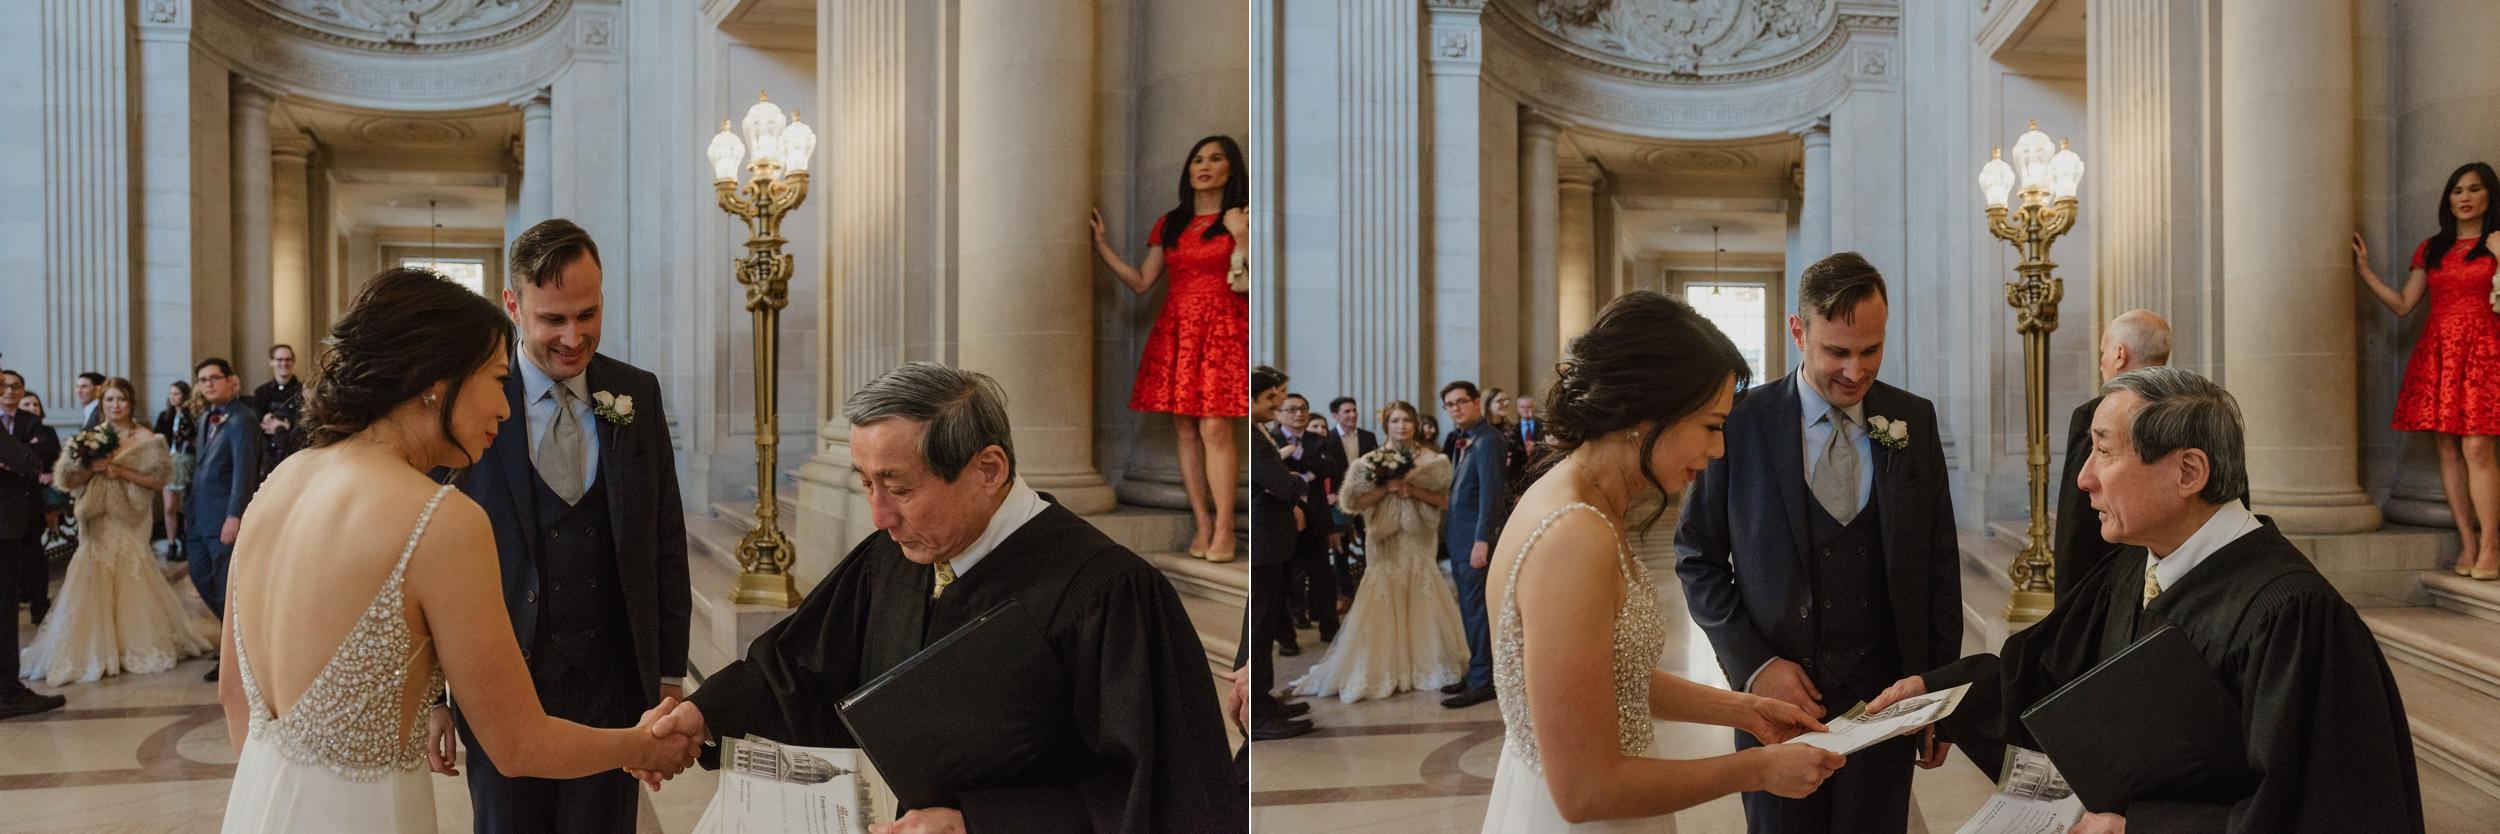 19-christmas-san-francisco-city-hall-elopement-vivianchen-123_WEB.jpg